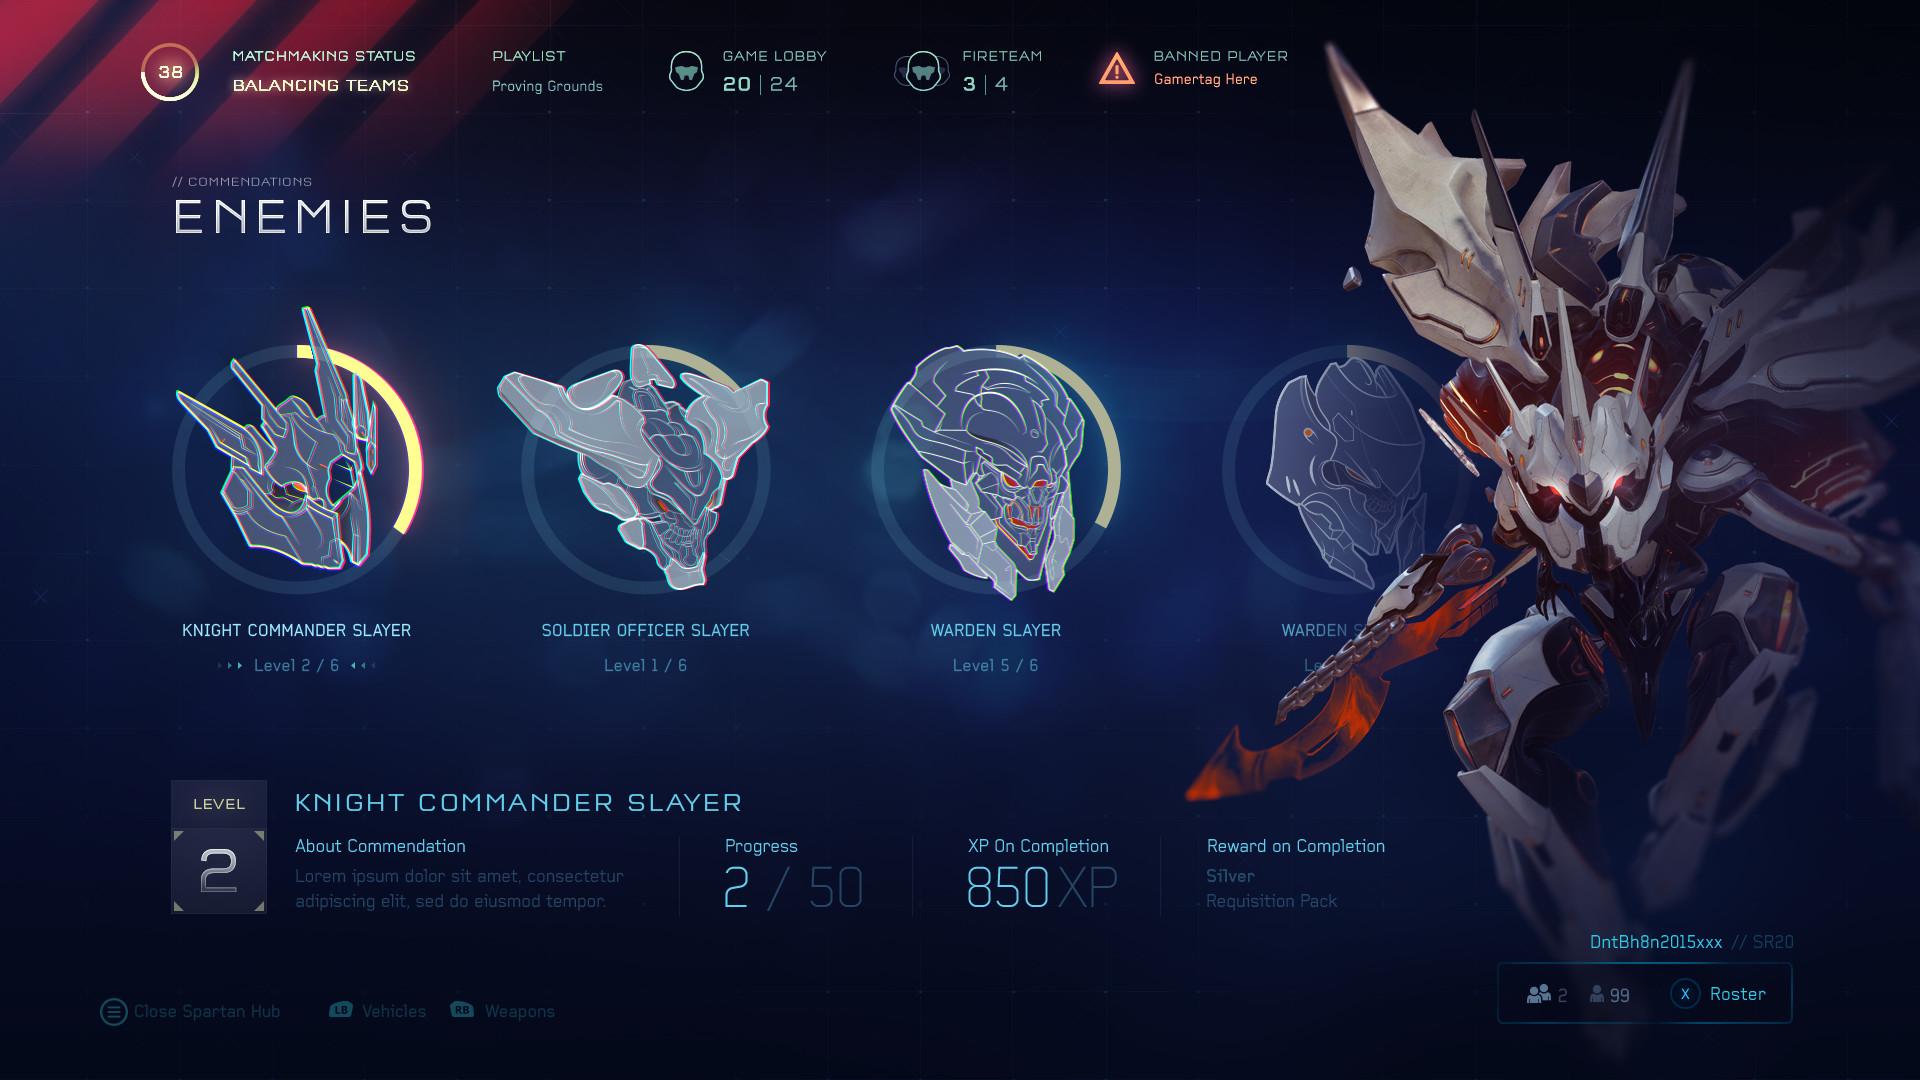 ramiro-galan-spartan-hub-commendations-3a